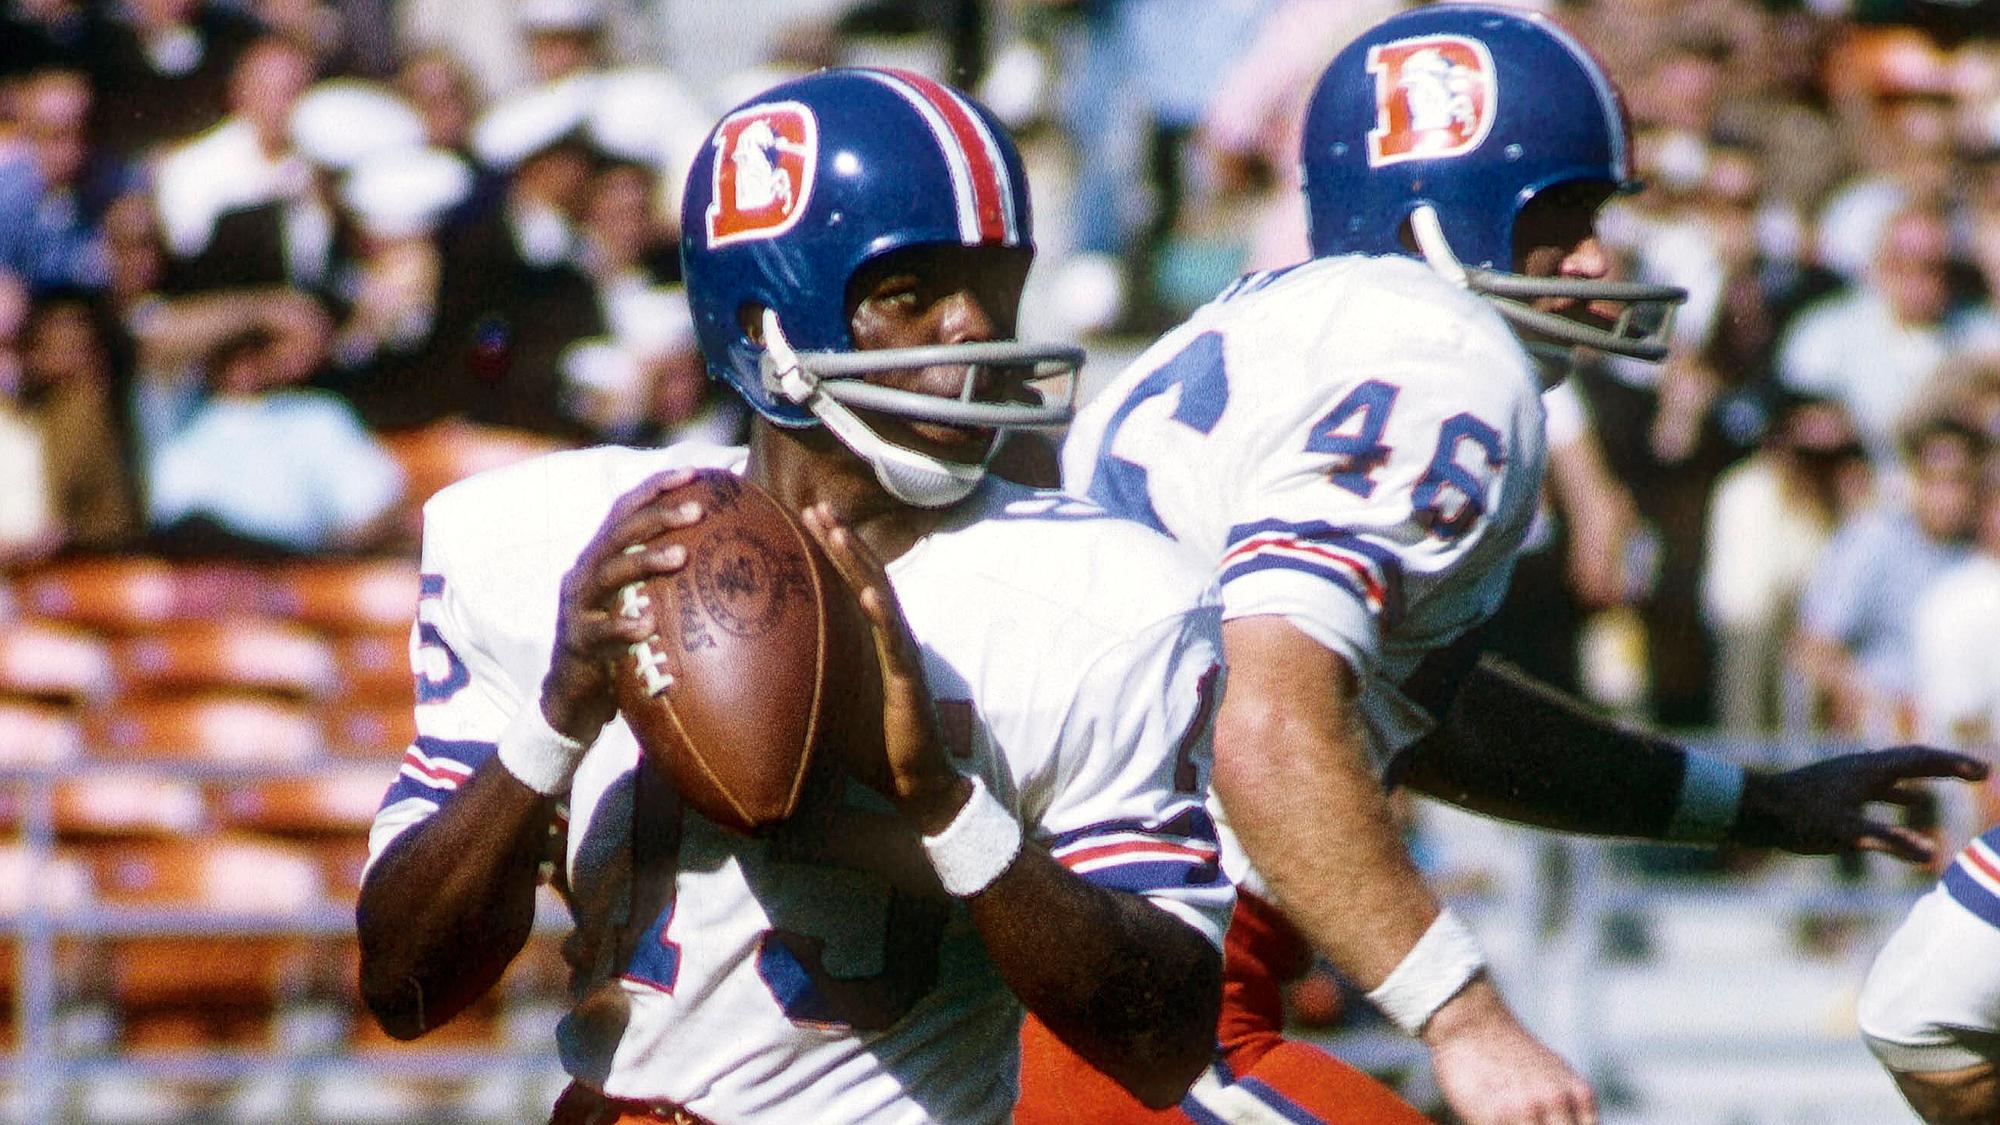 US PRESSWIRE Sports Archive